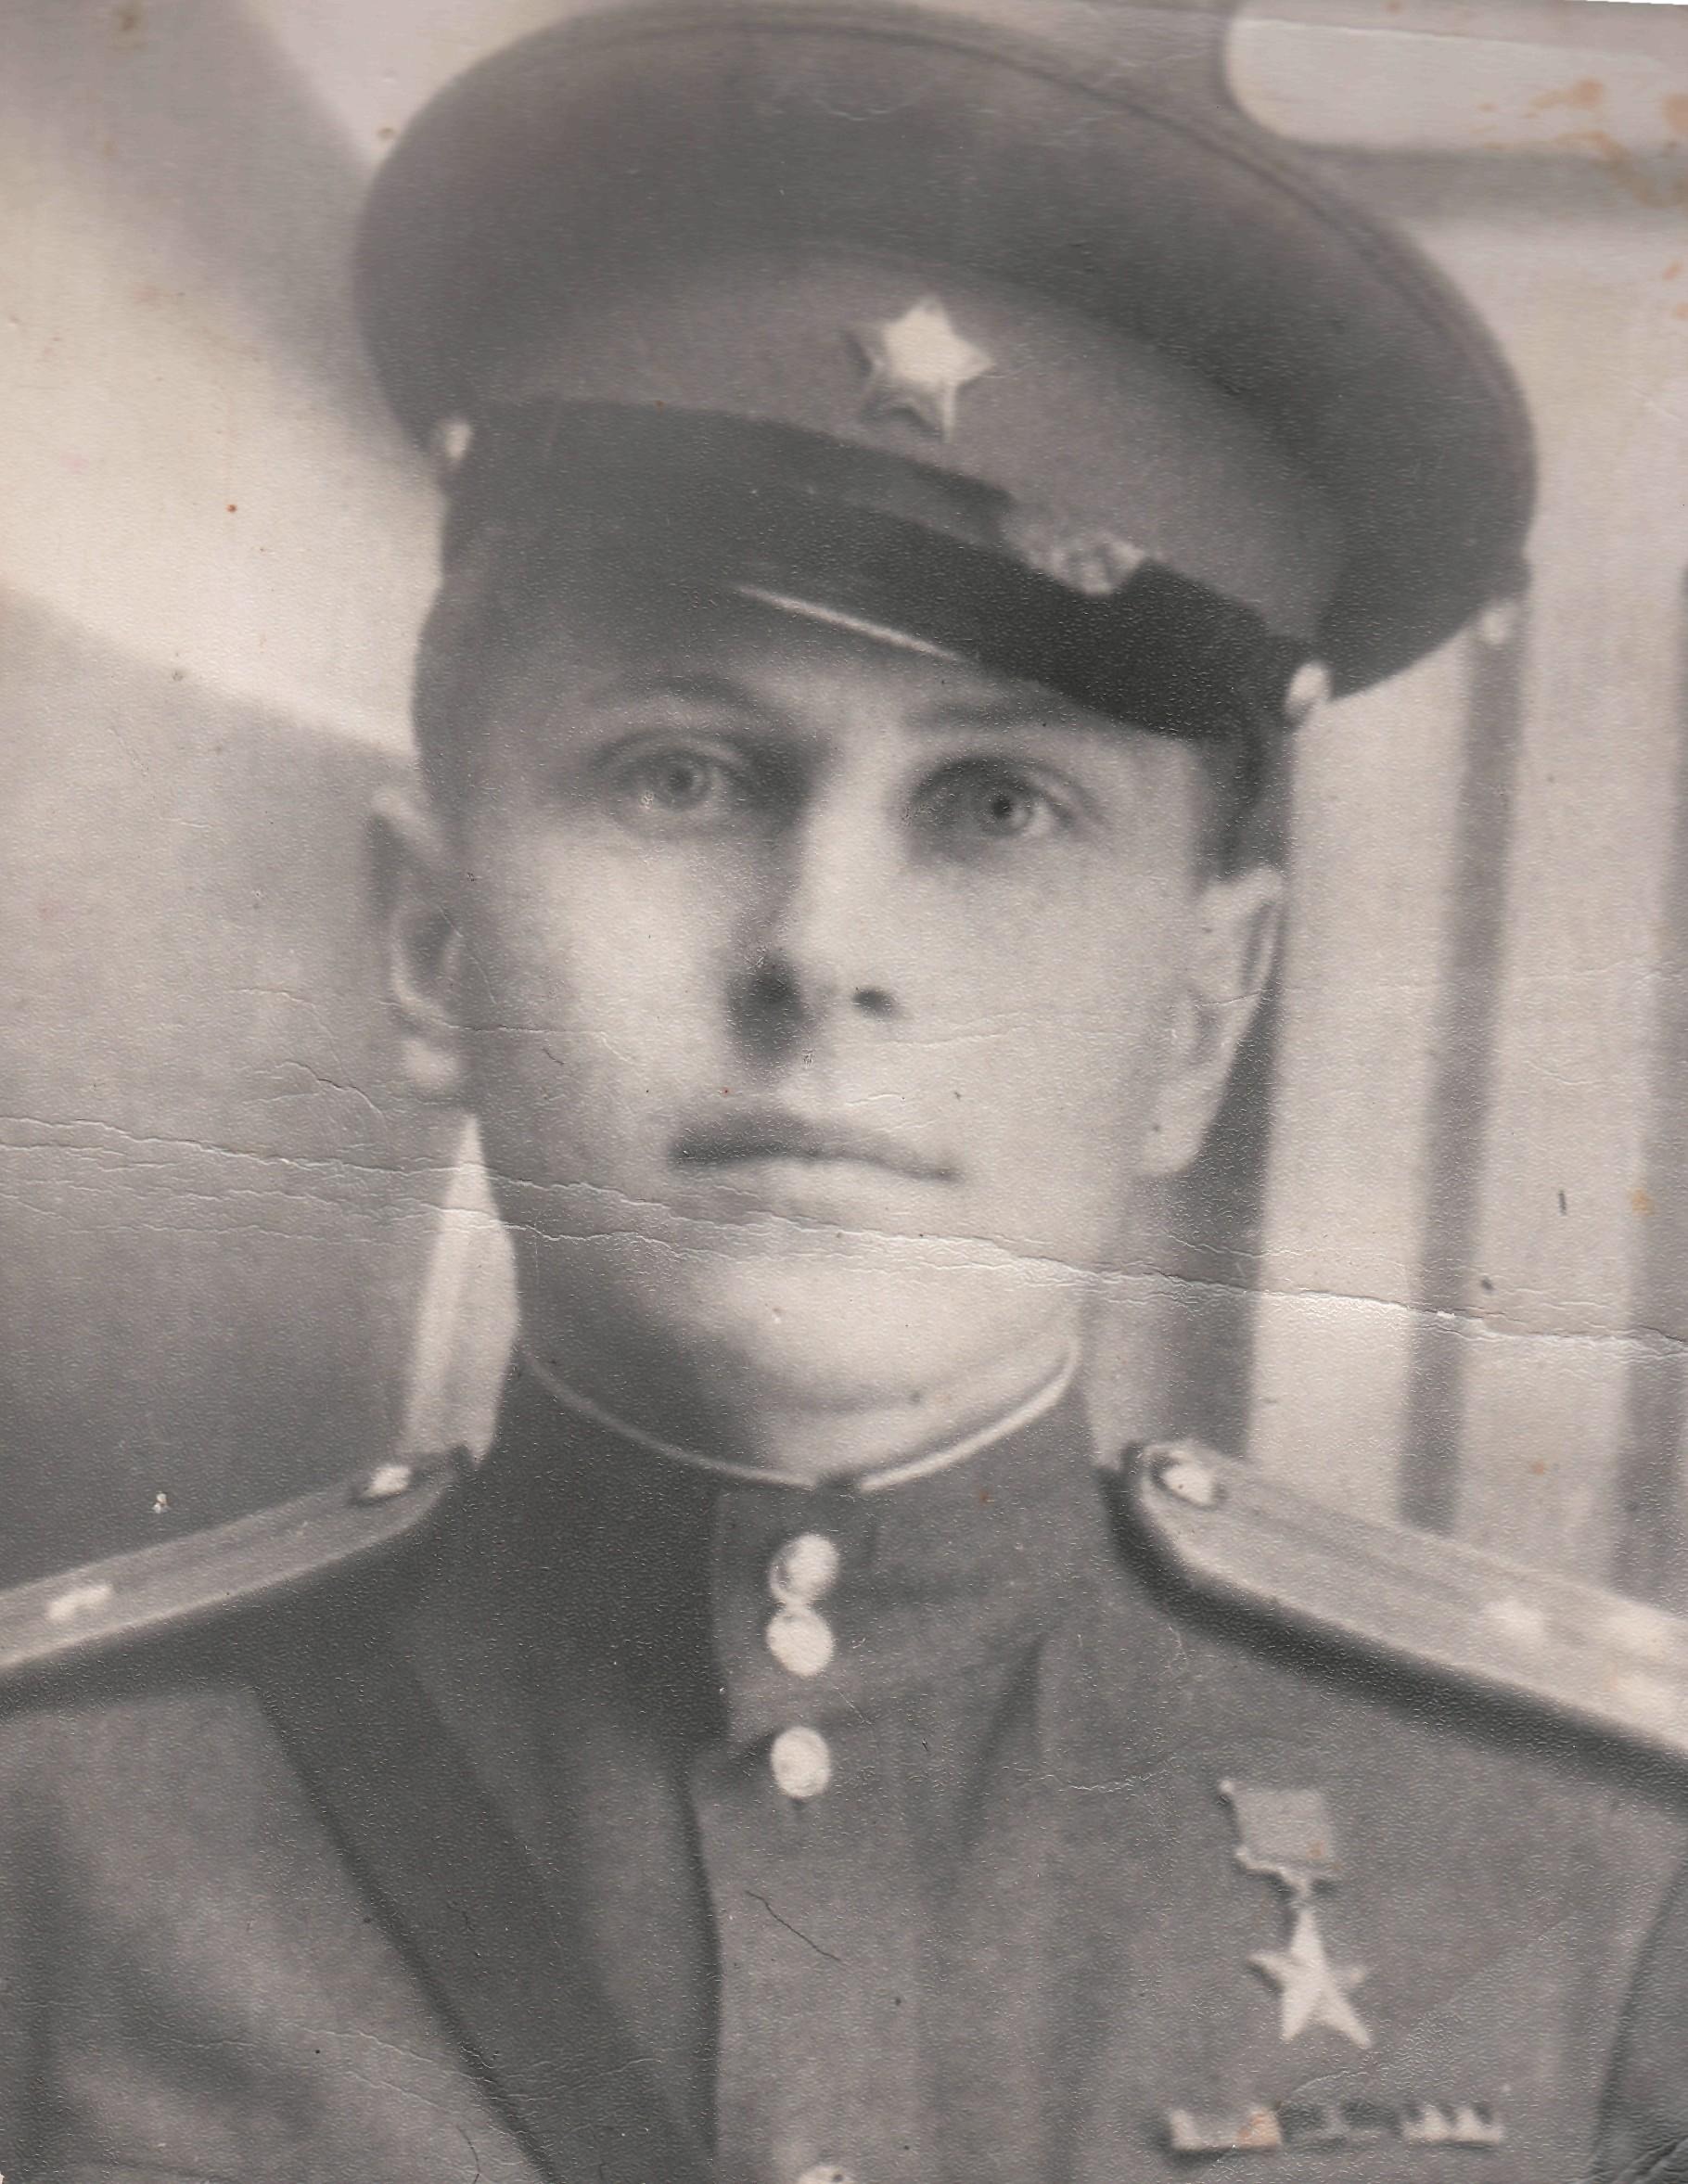 Яков Урванцев со Звездой Героя. 1943 г.